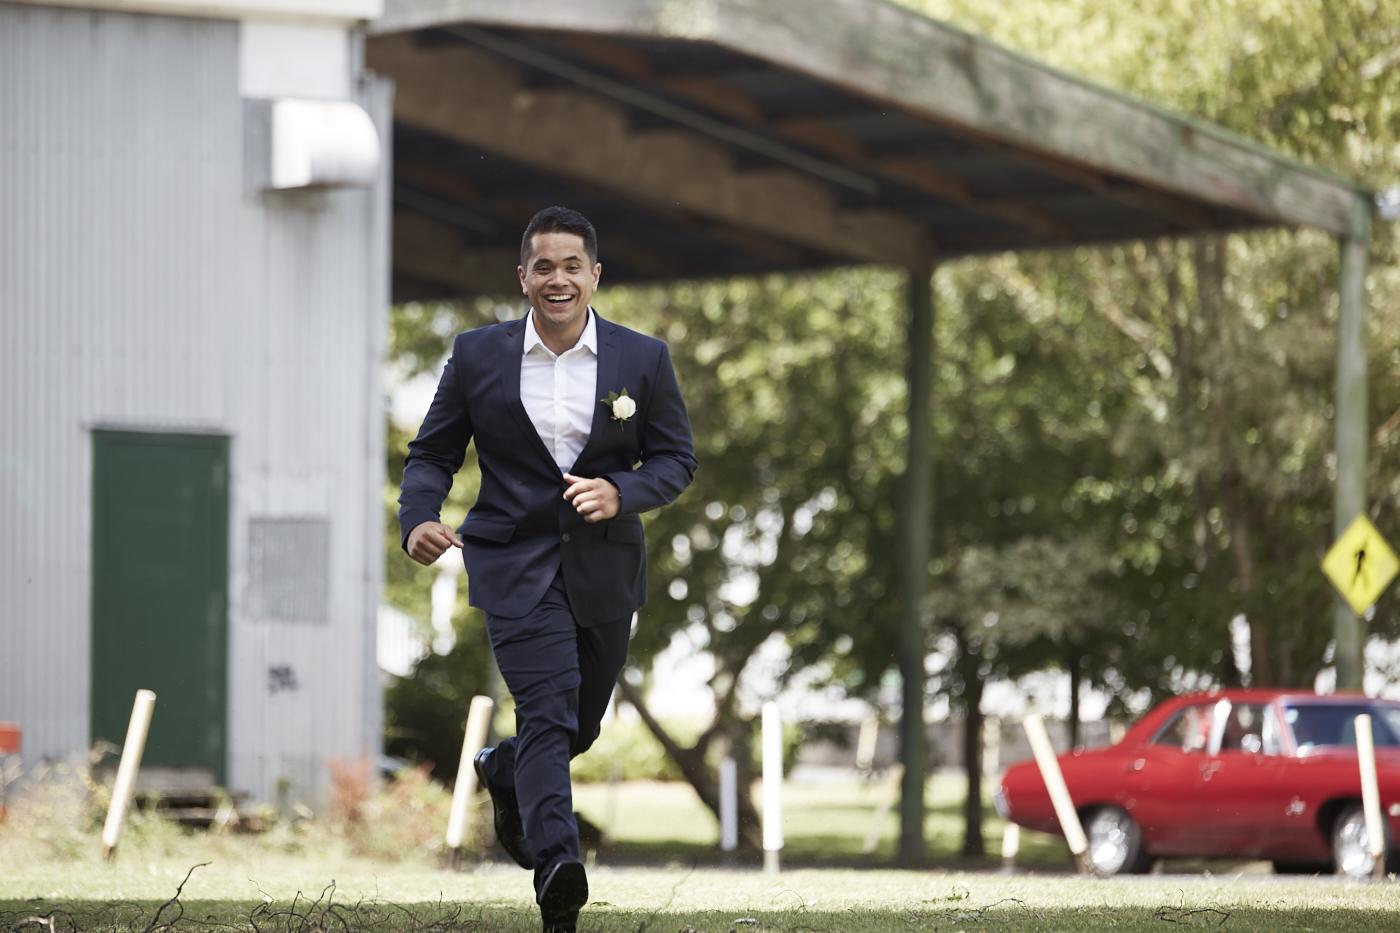 the running groom